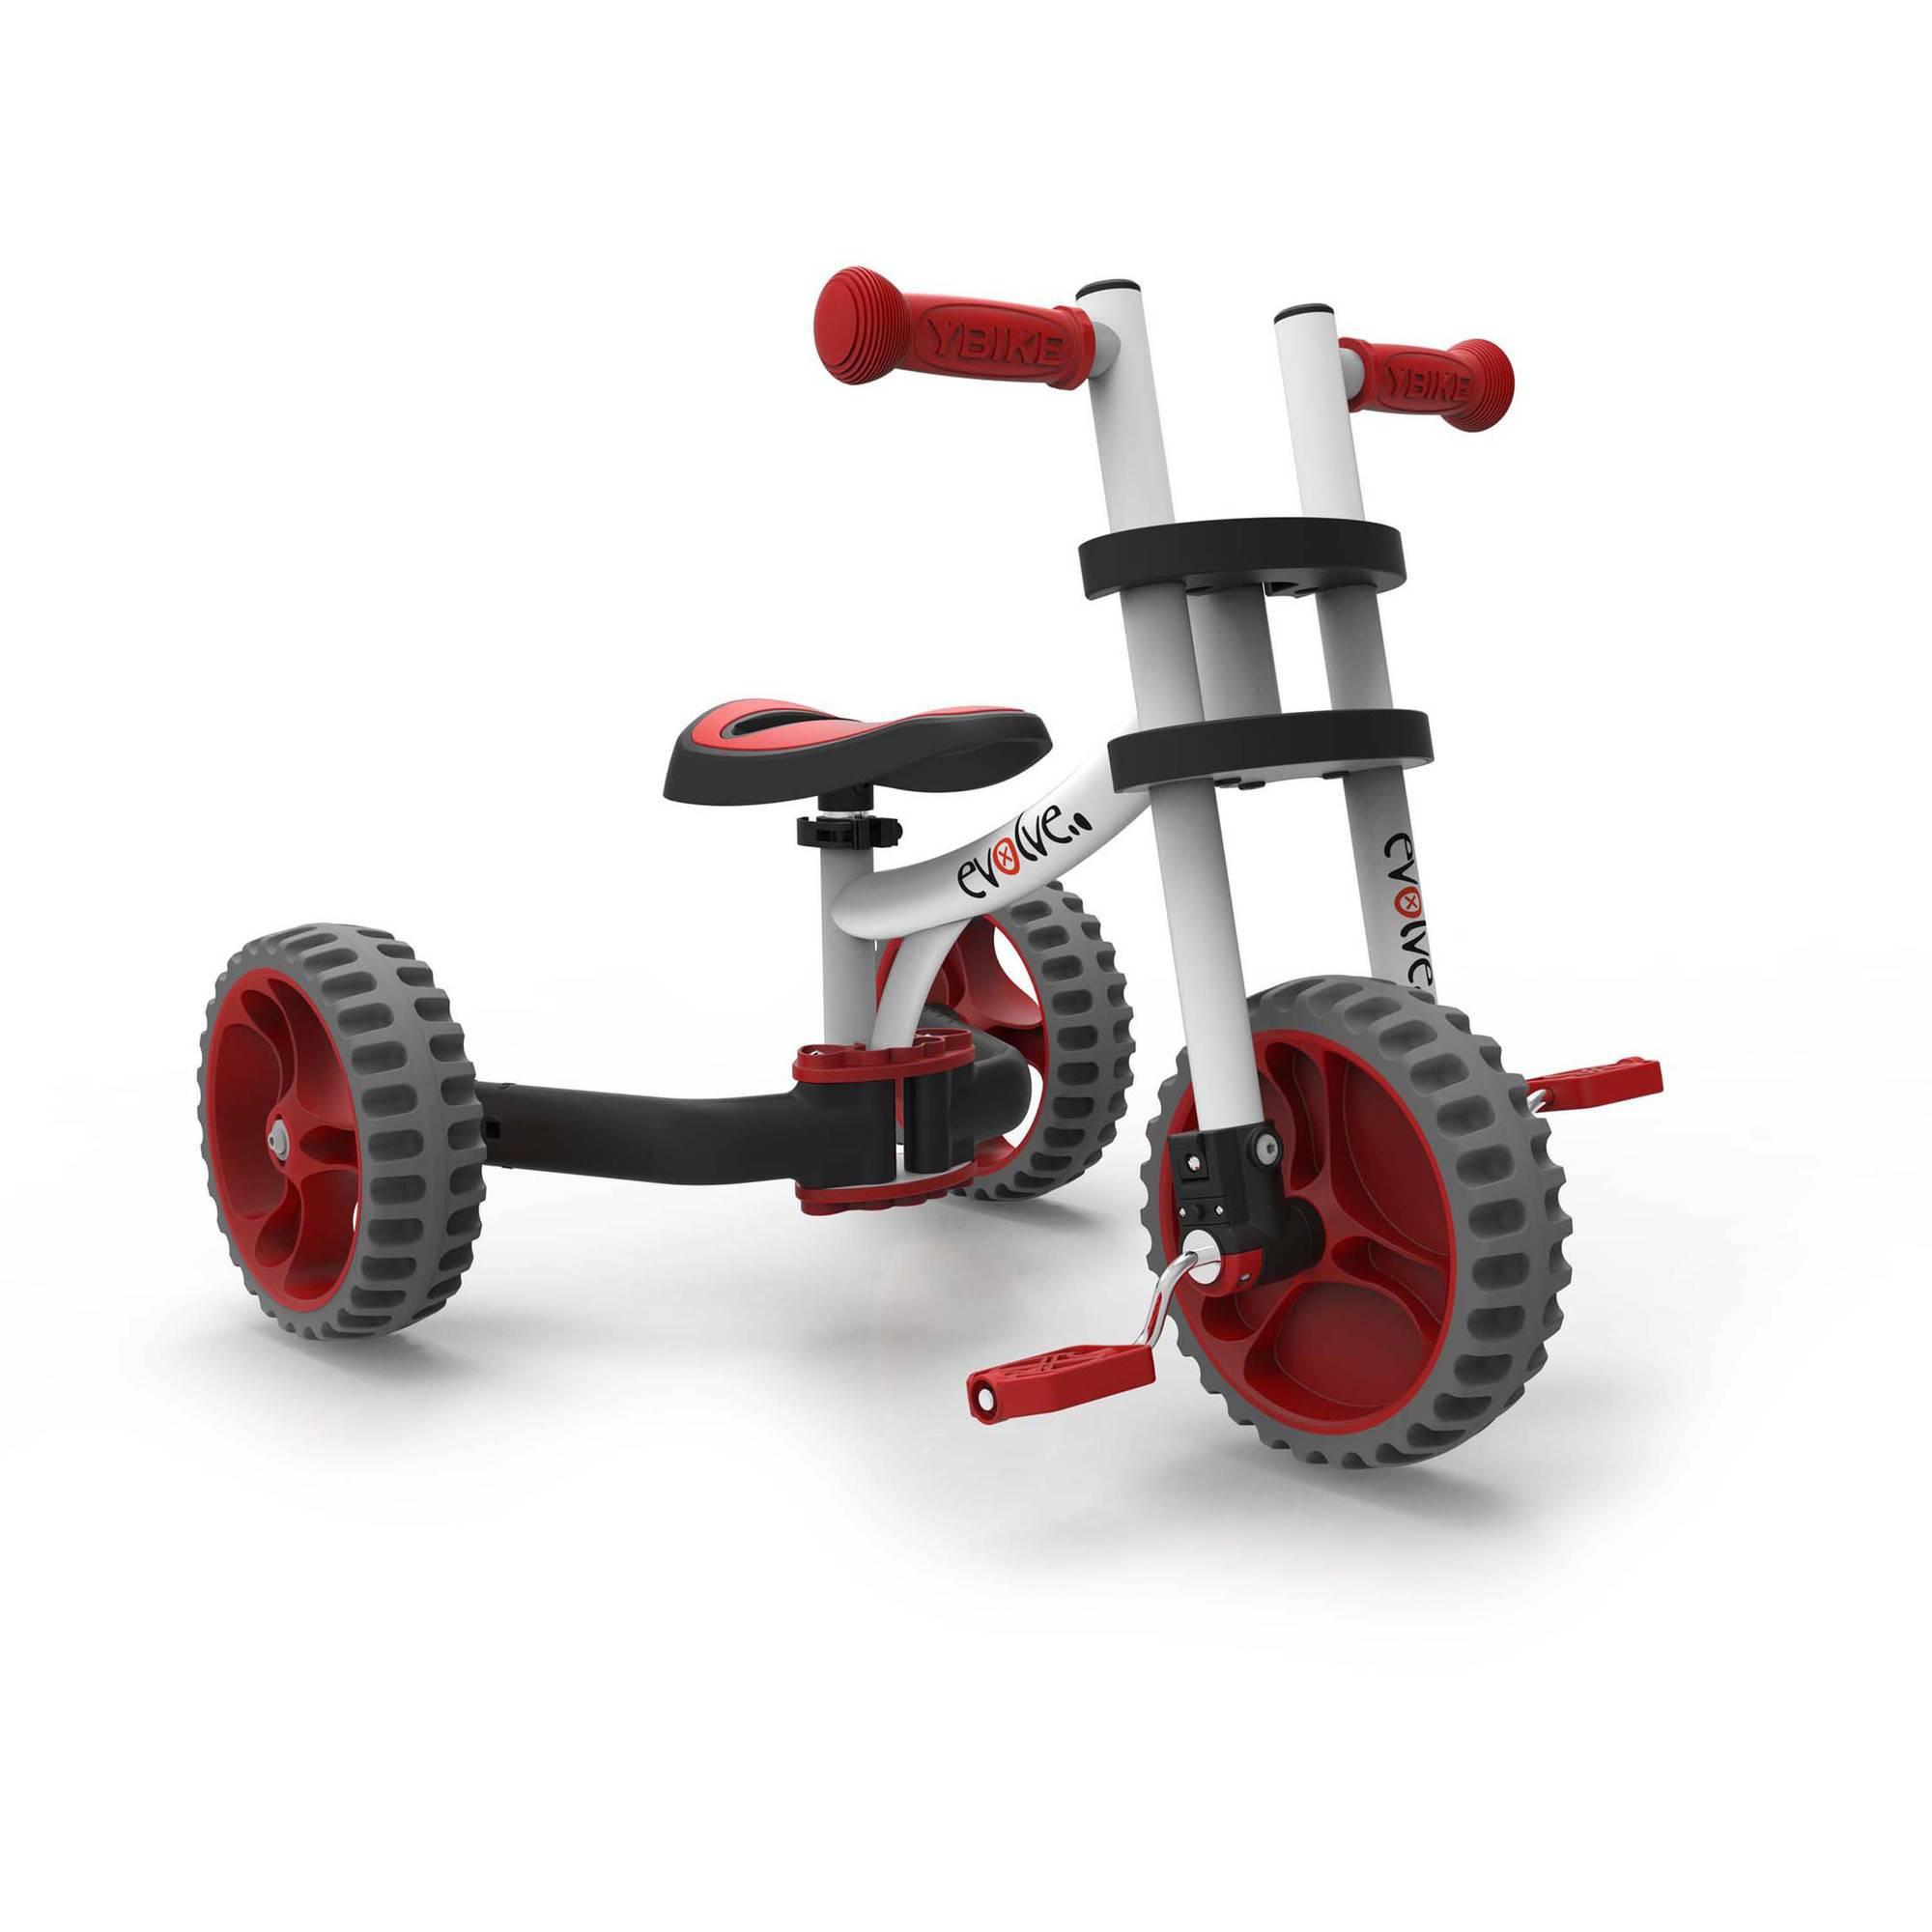 YBIKE Evolve Balance Trike, White/Red